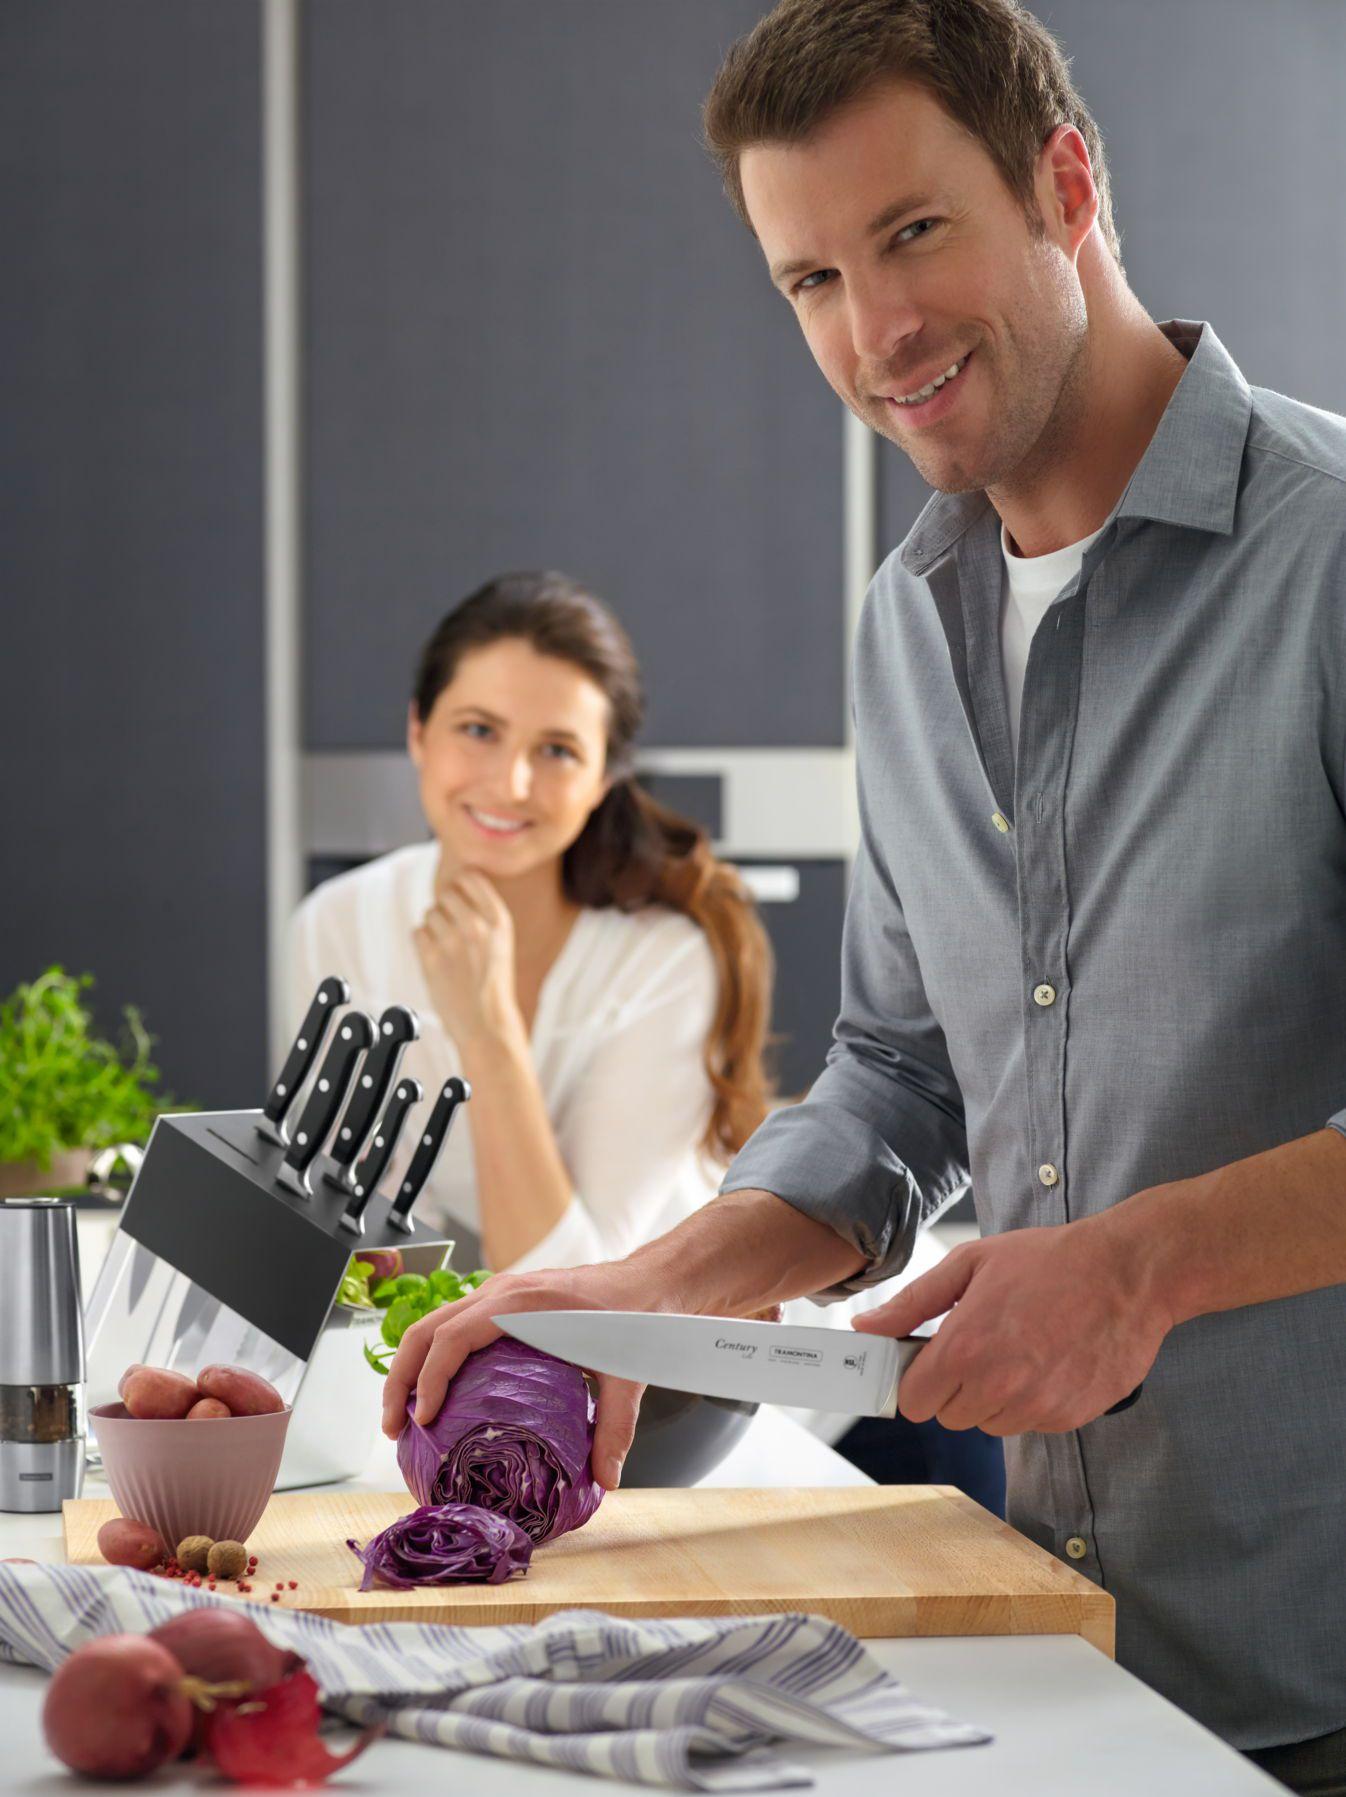 Faca para Cozinha 6?? Inox Century